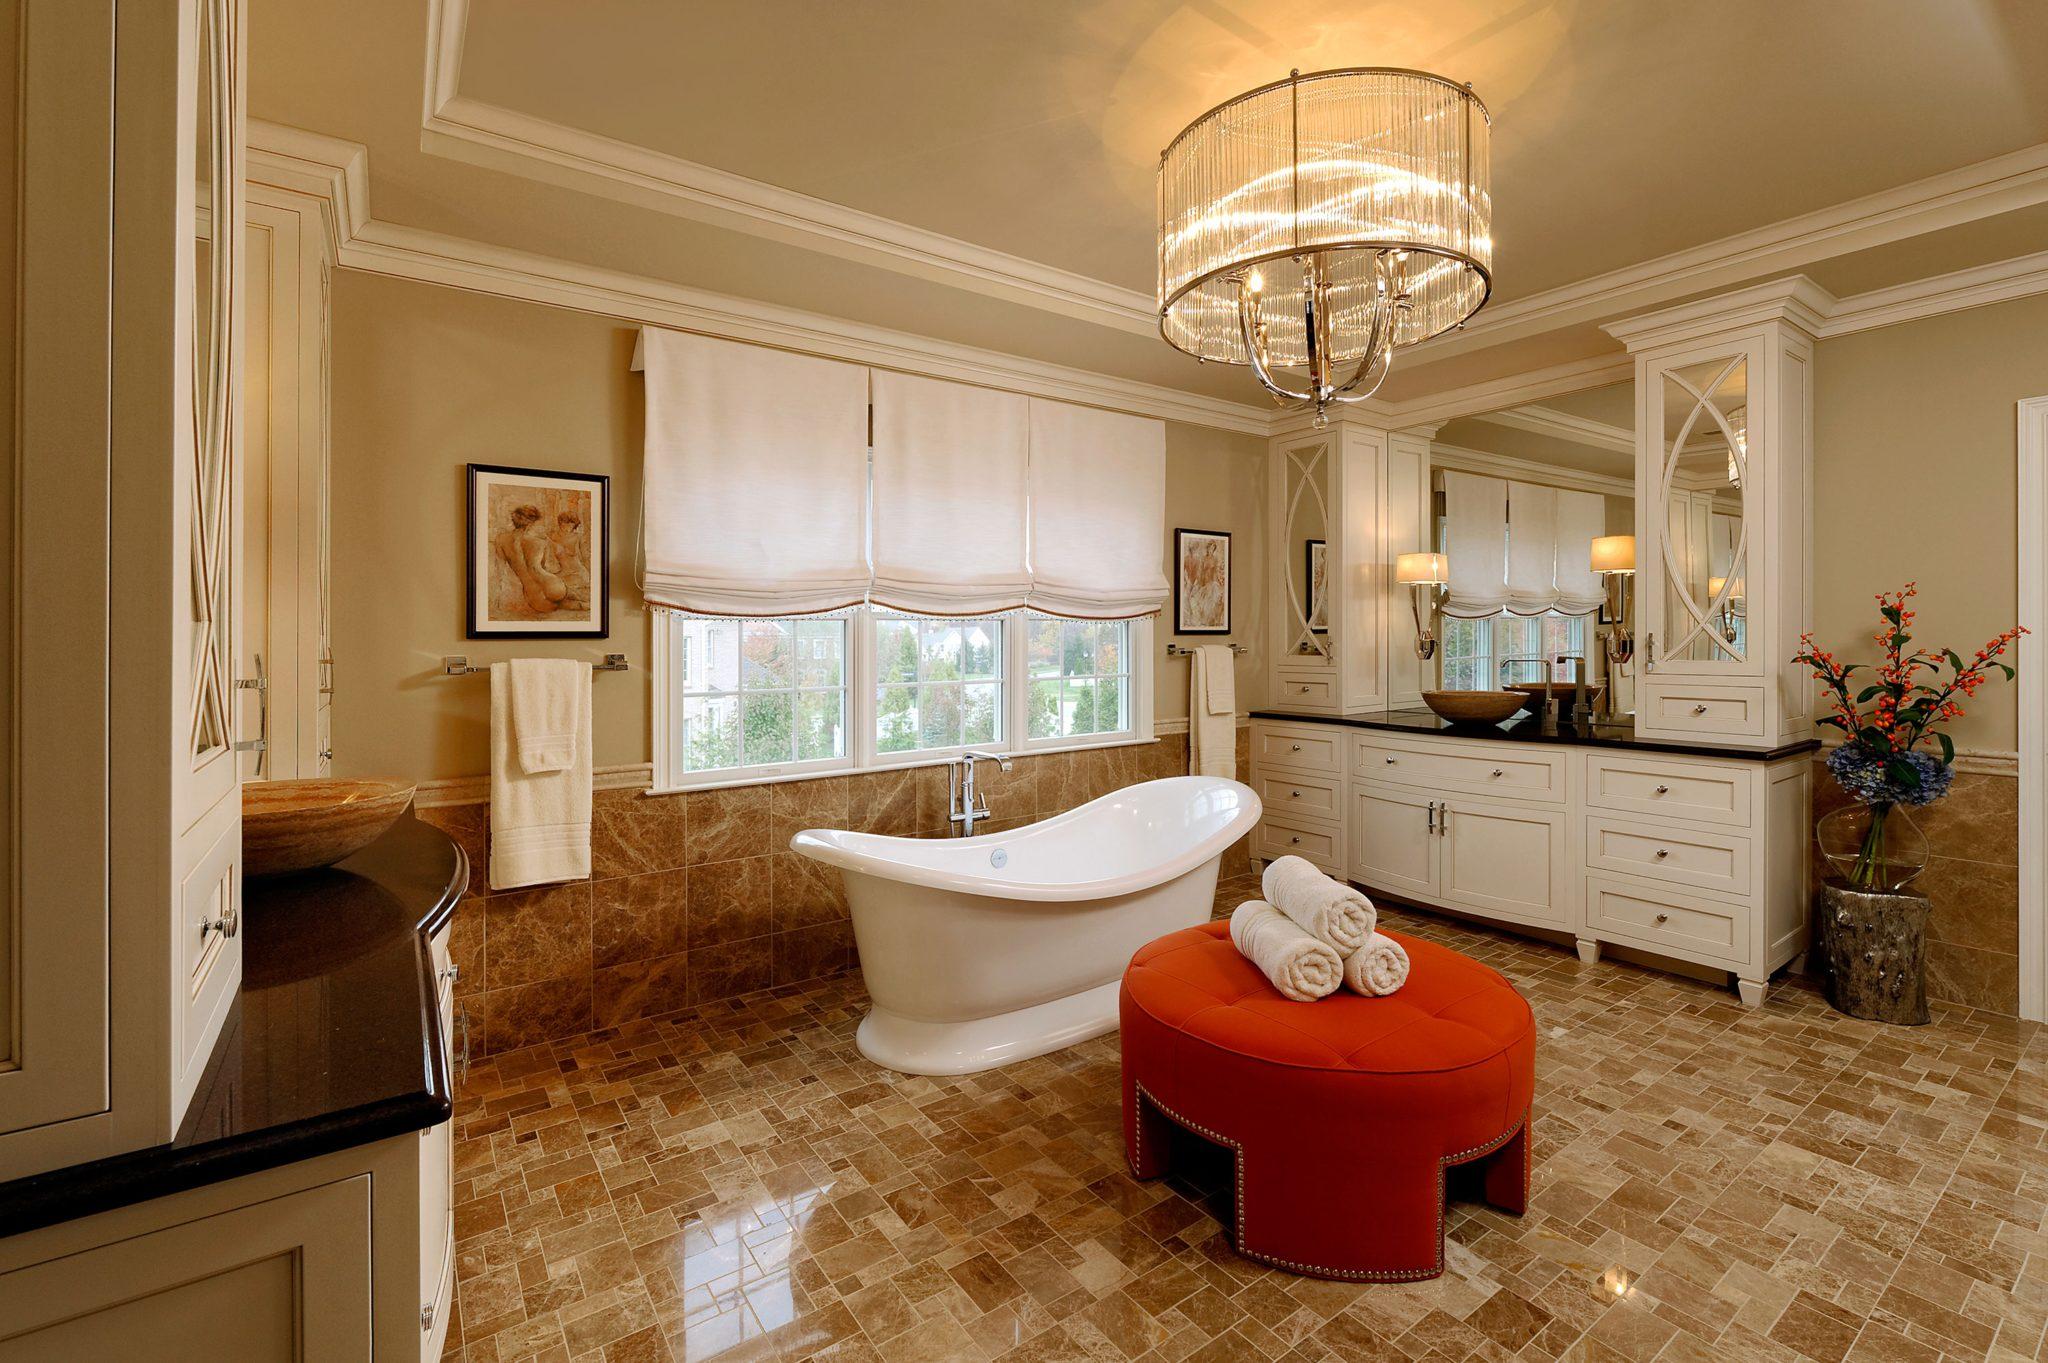 Interior design byPaula Grace Designs – Signature Grace